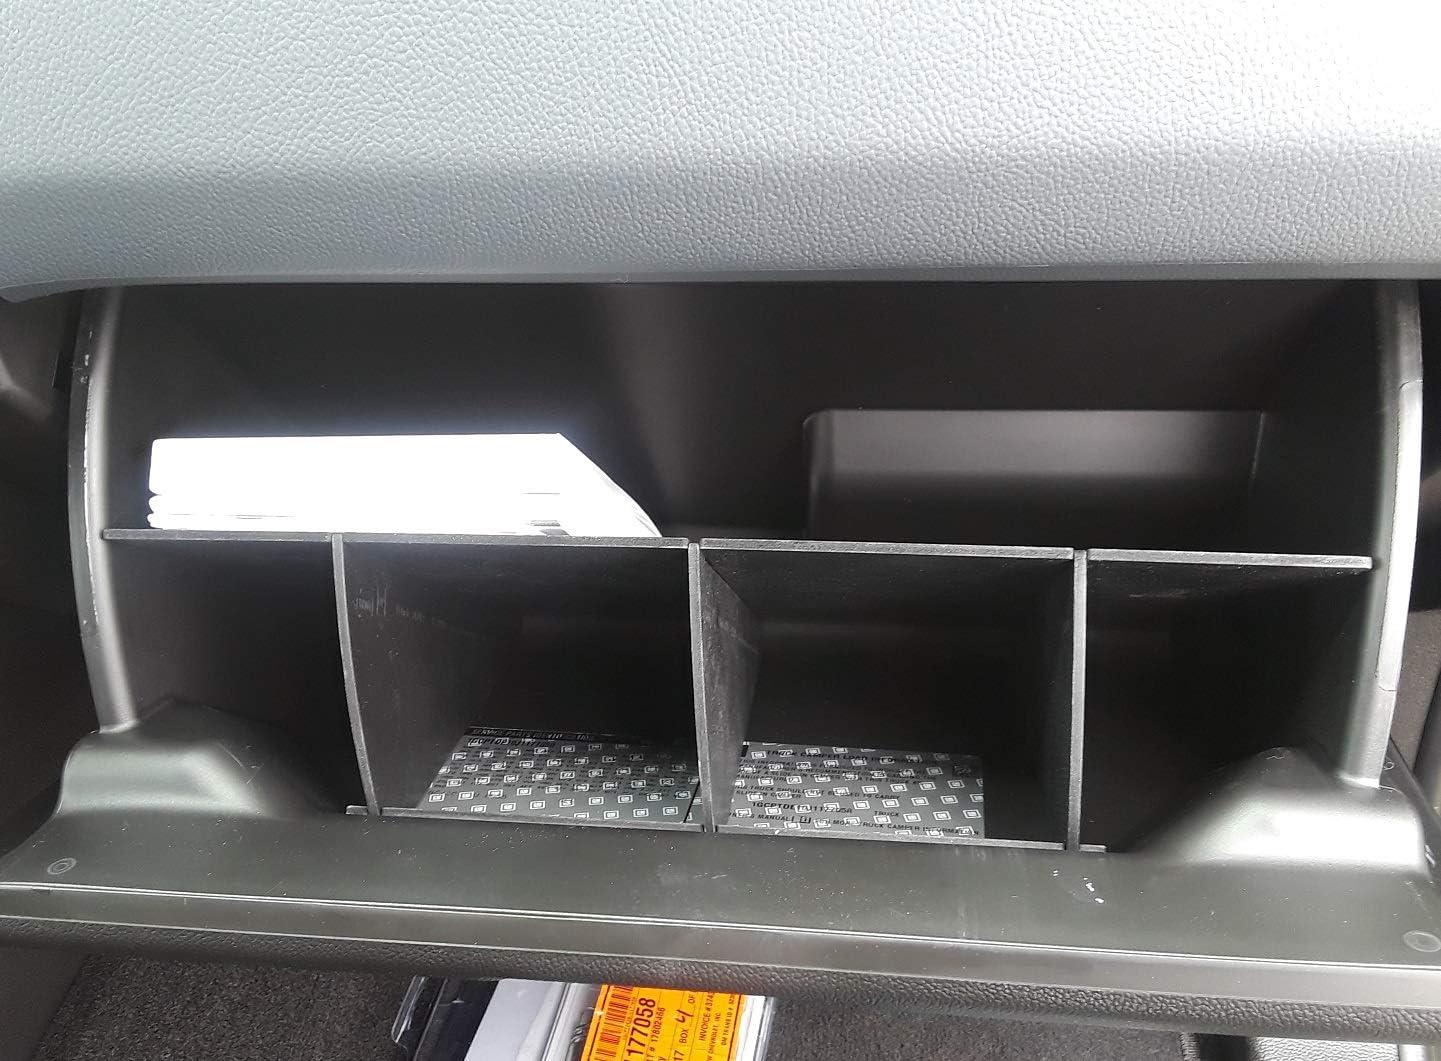 Center Console Organizer Tray for Chevy Colorado//GMC Canyon - Made in USA Vehicle OCD 2015-2019